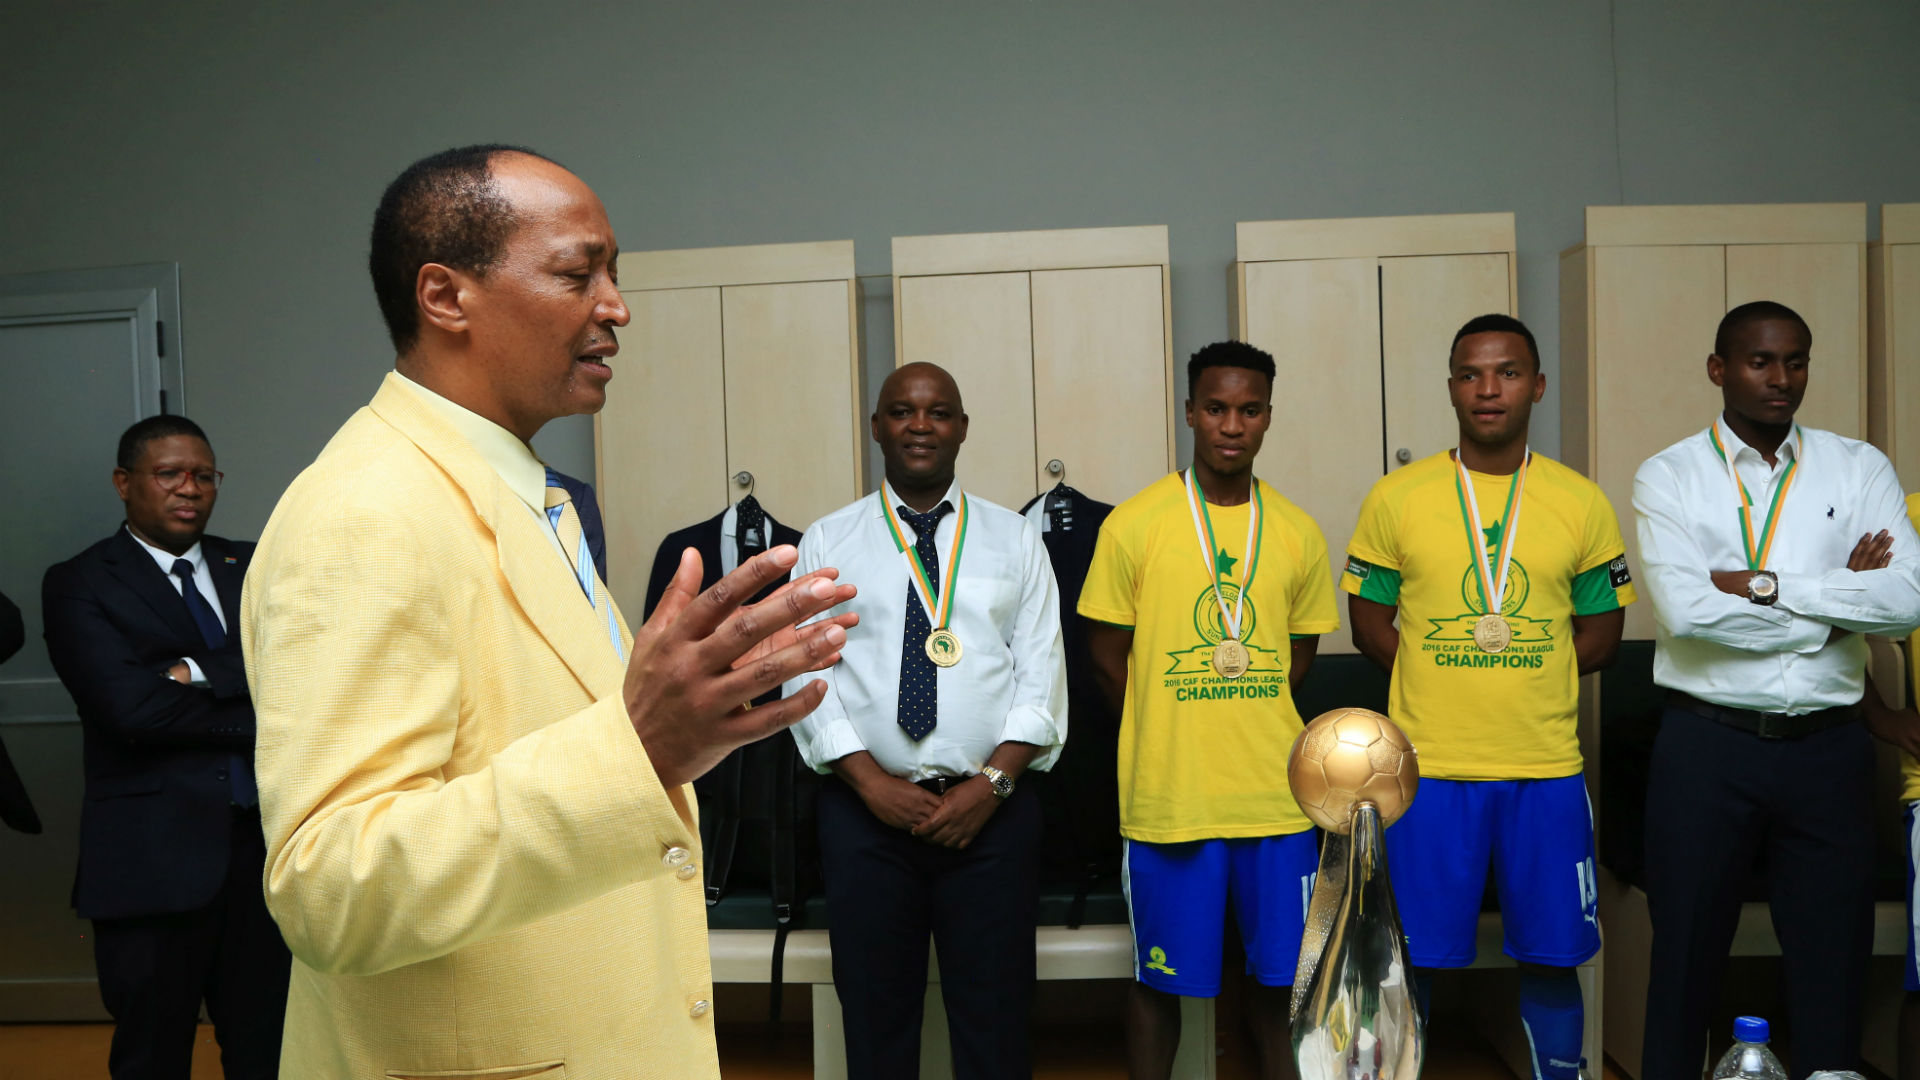 Mosimane: Mamelodi Sundowns address rumours regarding coach's contract